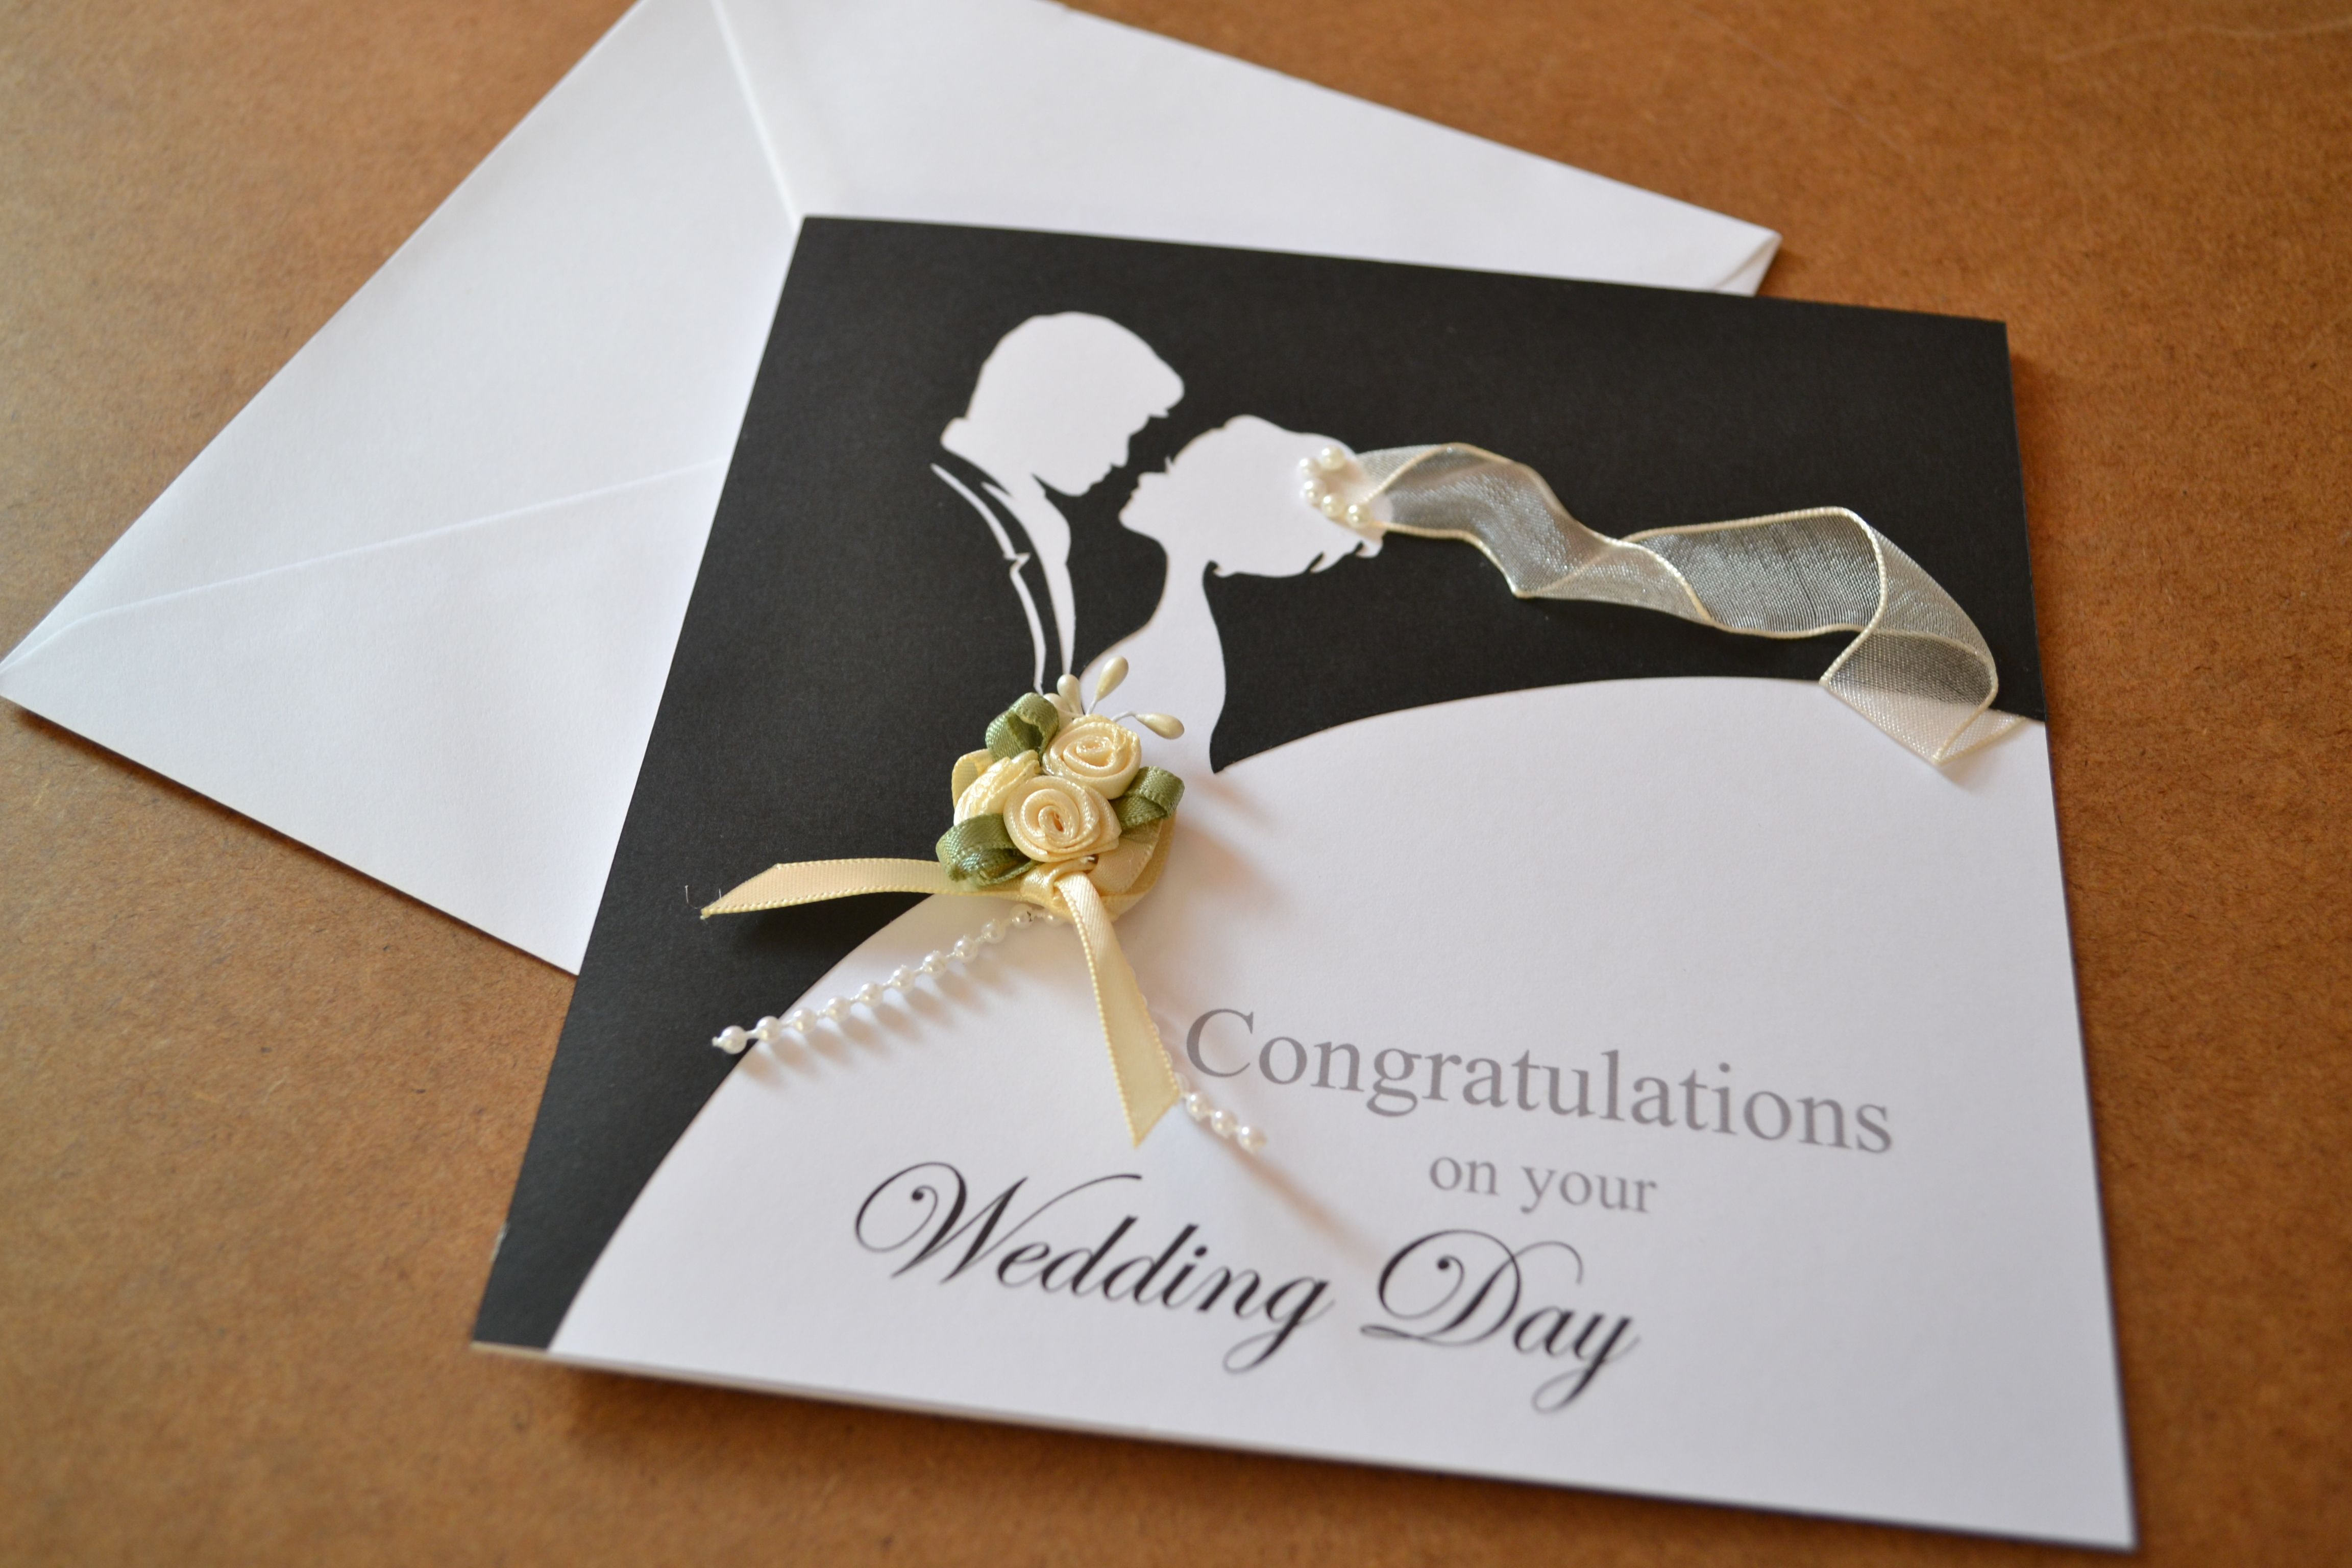 Diy Wedding Invitations Printable Sample Invitation Ideas For Pijmqui Creative Wedding Invitations Fun Wedding Invitations Wedding Invitation Card Design